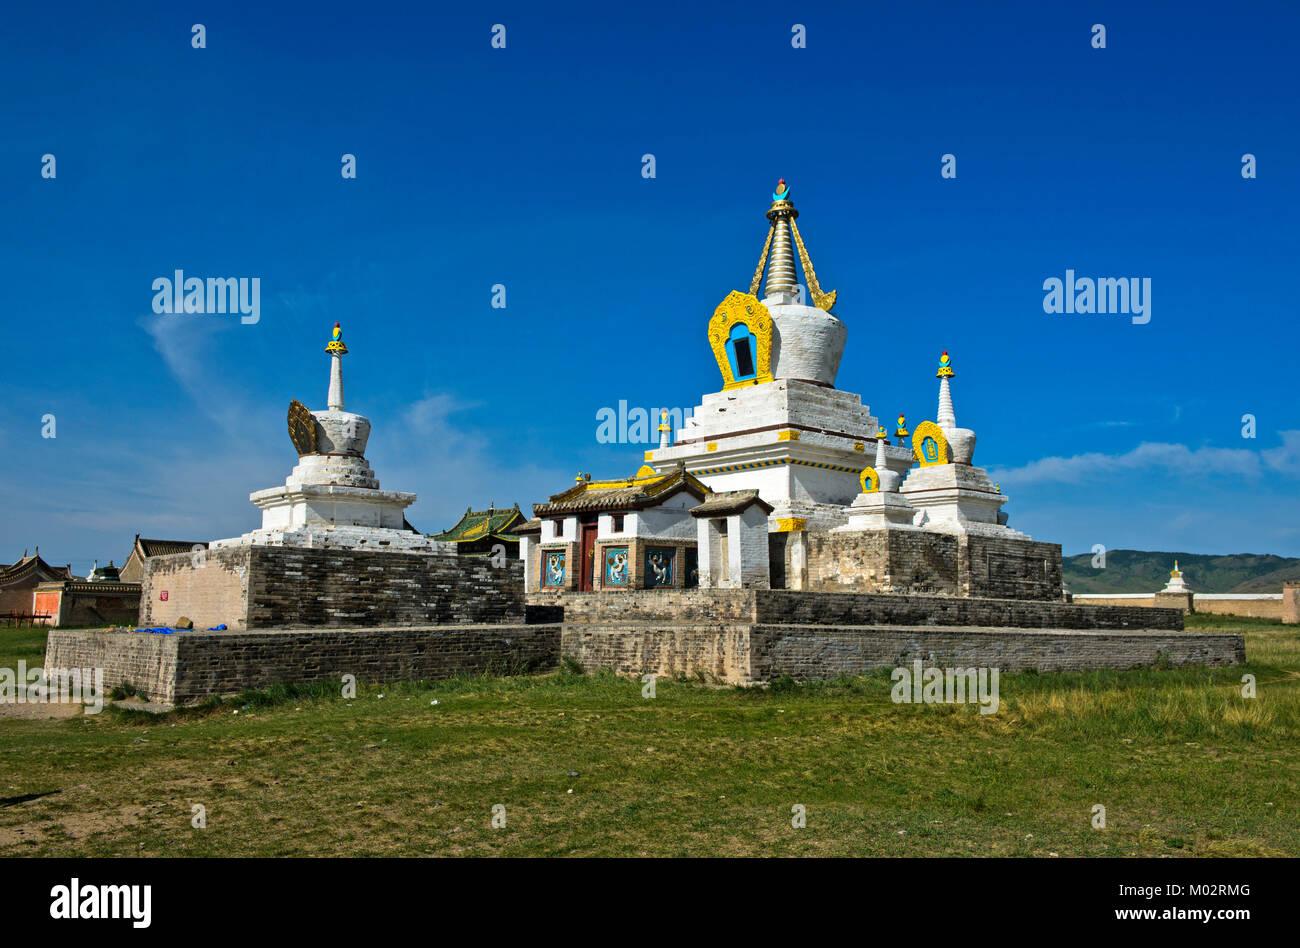 Mongolia, Kharkhorin: Golden stupa or Bodhi Suburgan at Erdene Zuu Monastery - Stock Image